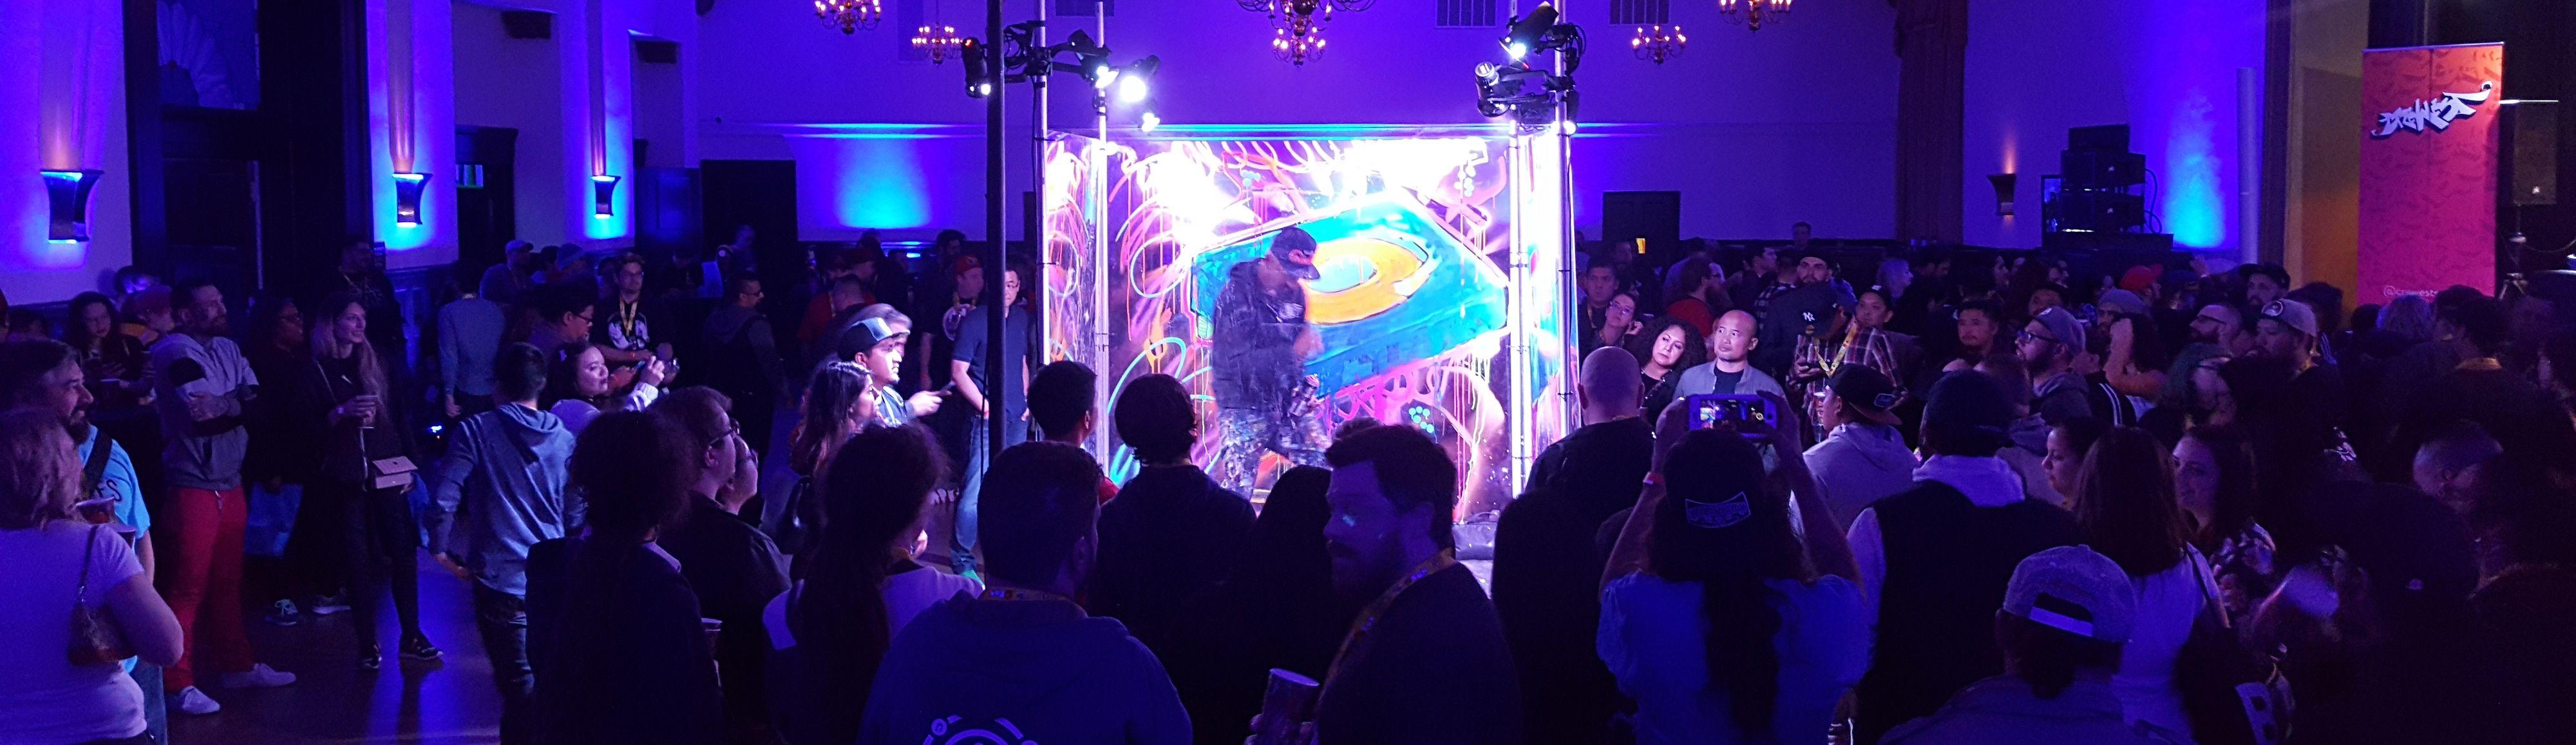 experiential marketing event in LA